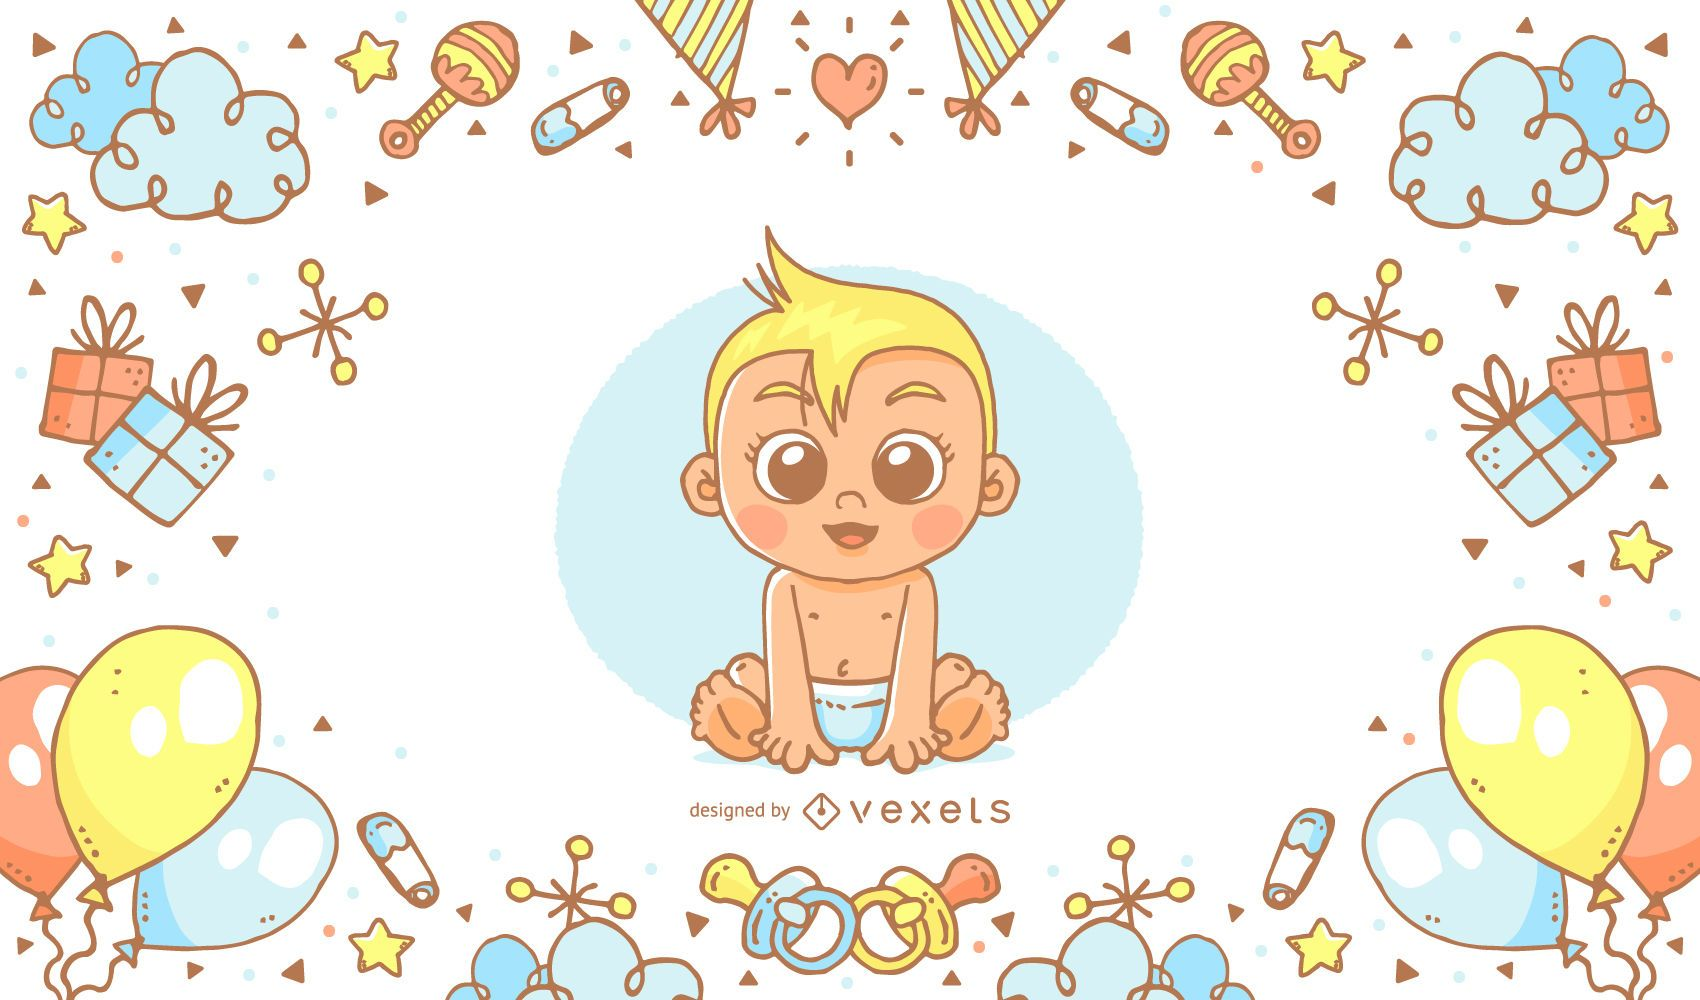 Cartel de baby shower dibujado a mano